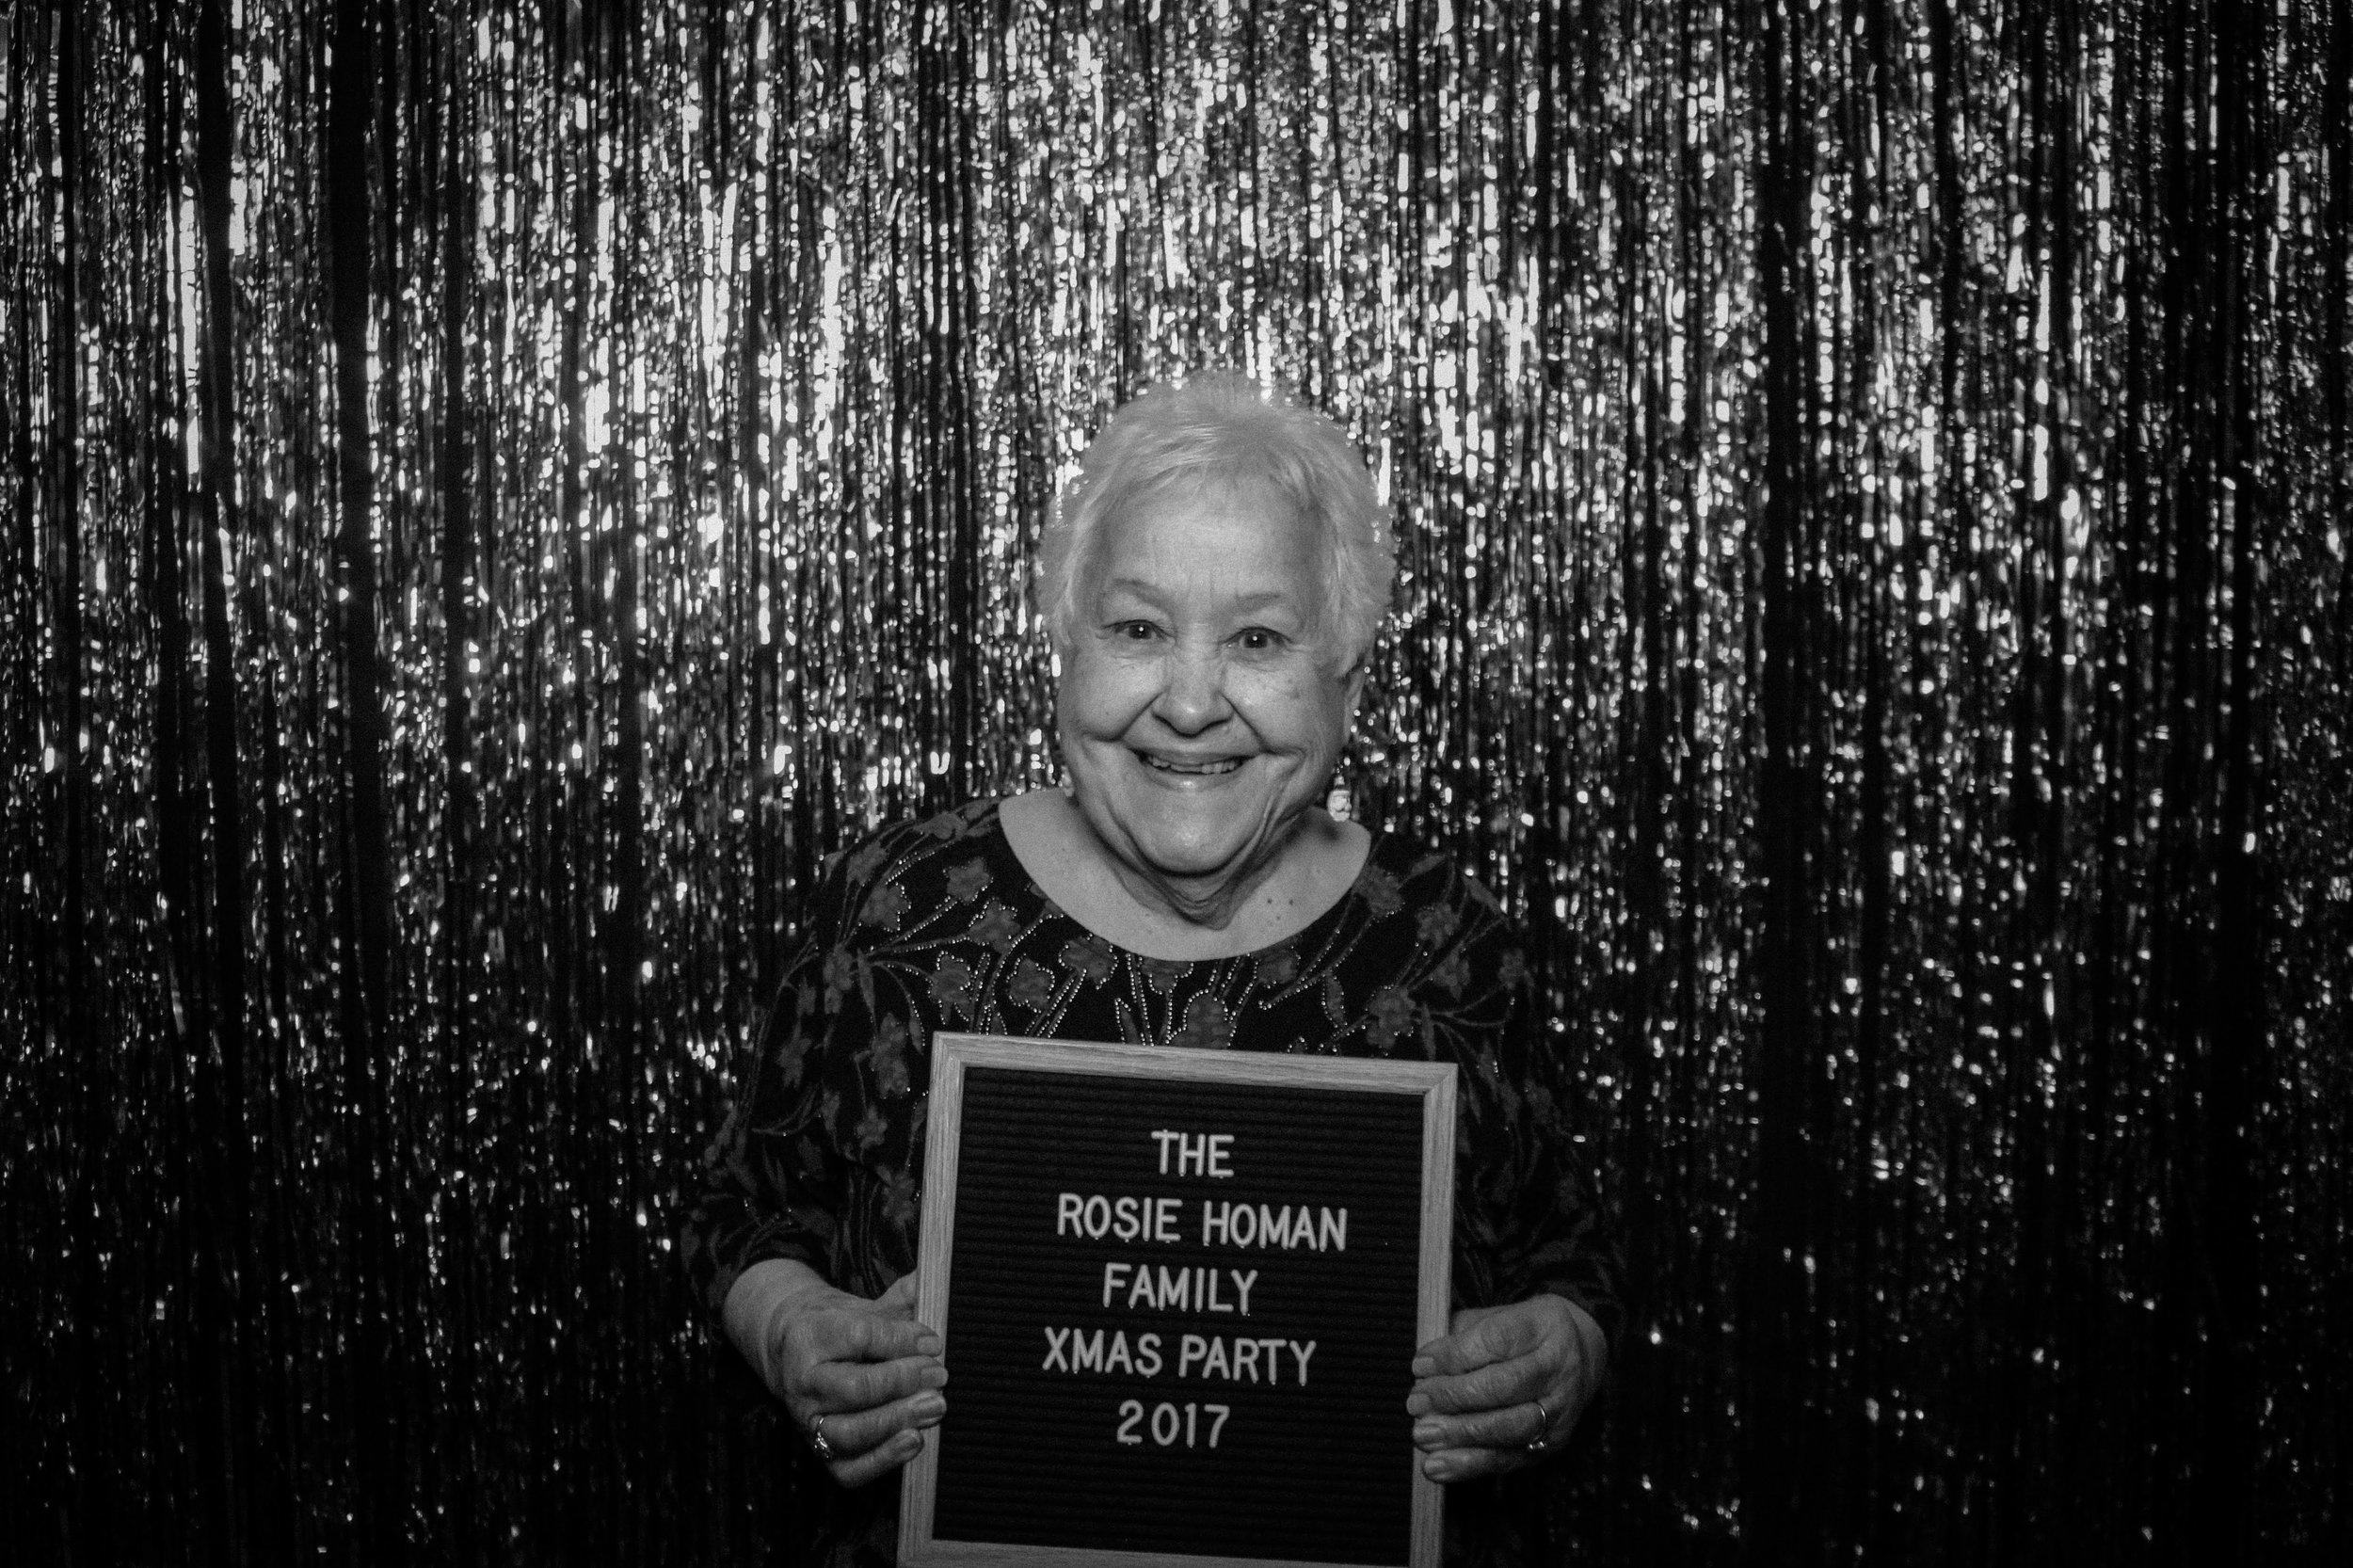 Rosie Homan Xmas Party 2017-051.jpg